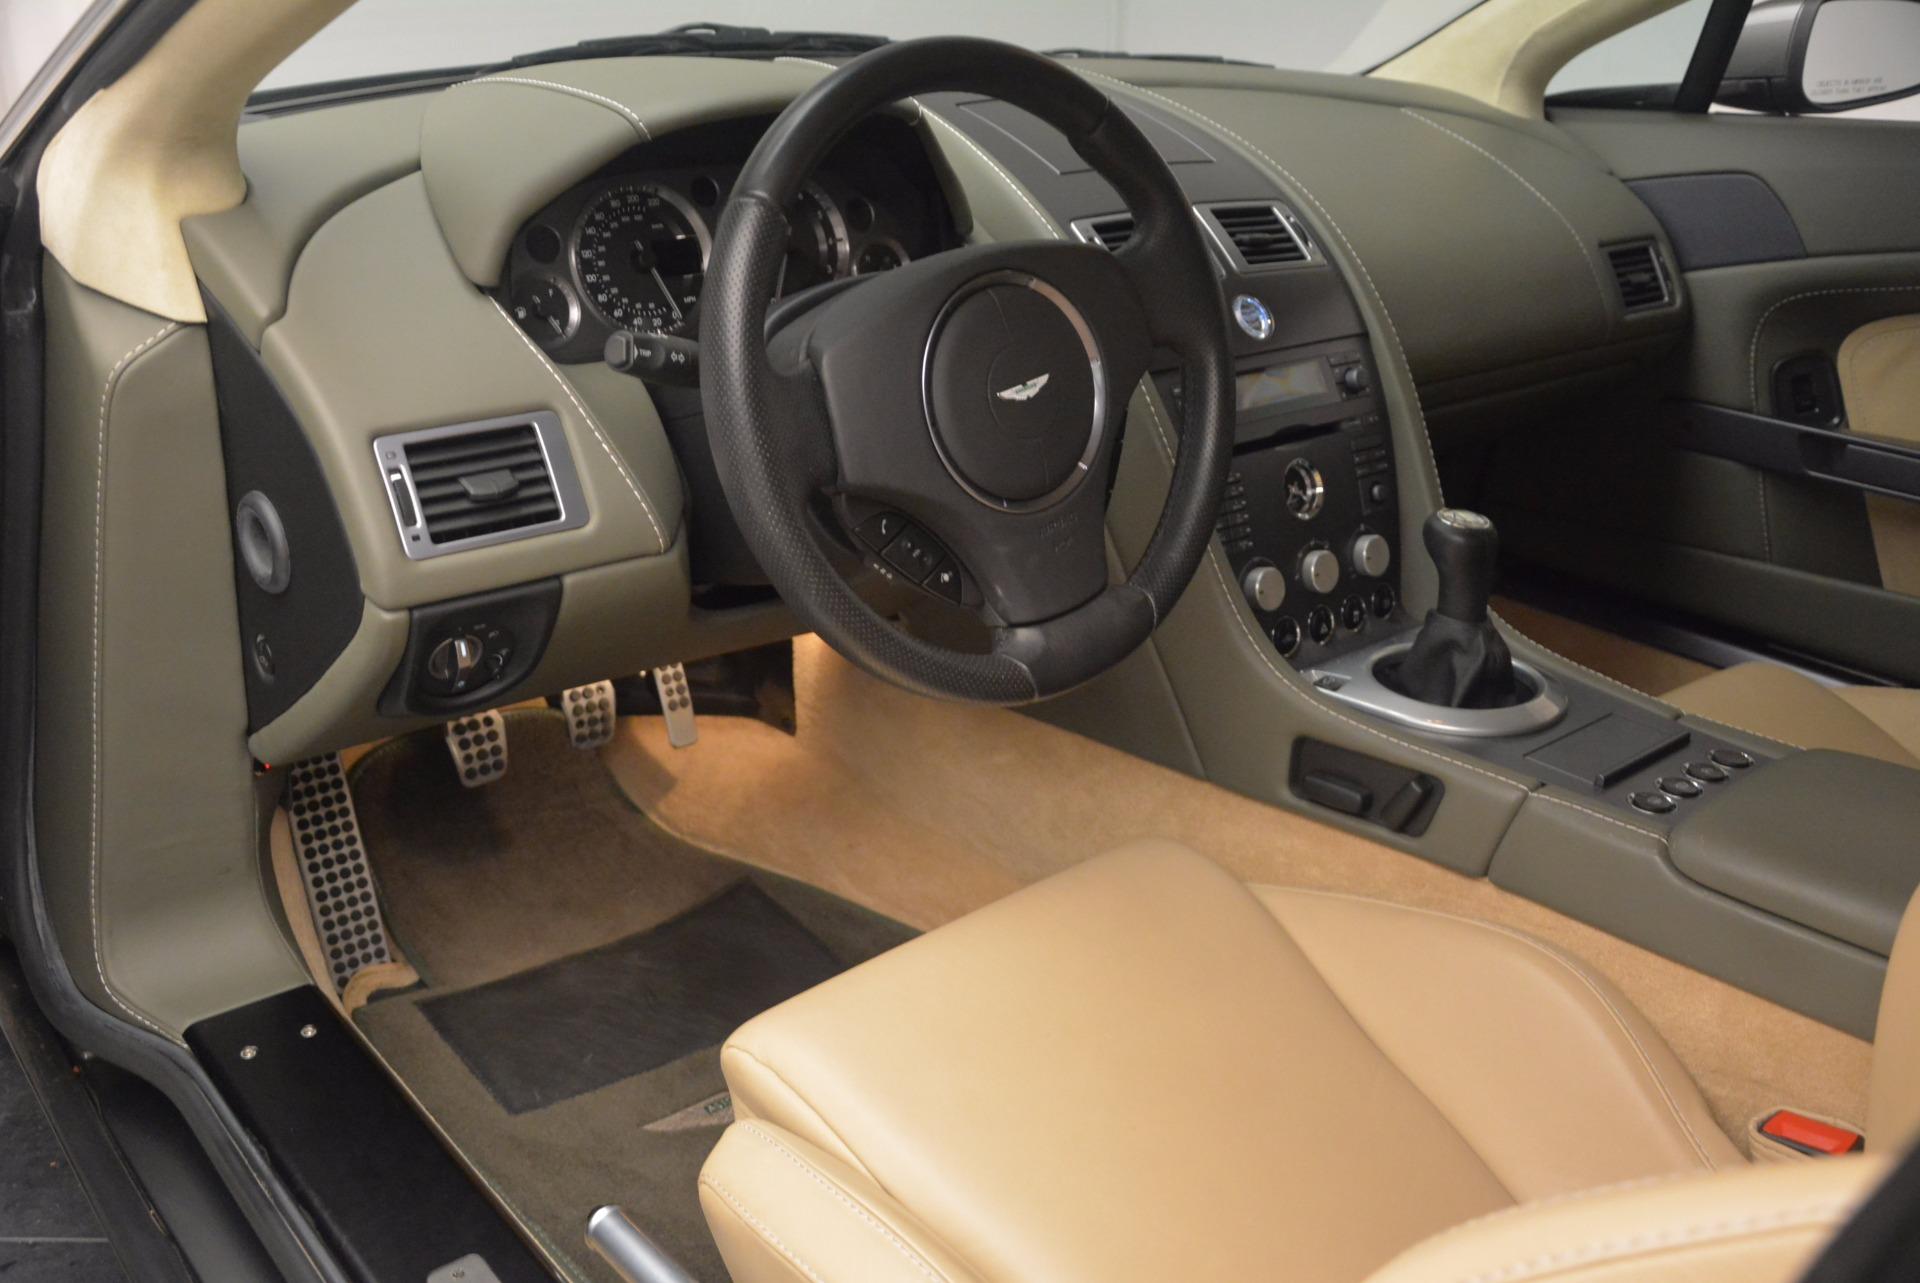 Used 2006 Aston Martin V8 Vantage  For Sale In Greenwich, CT 1658_p14